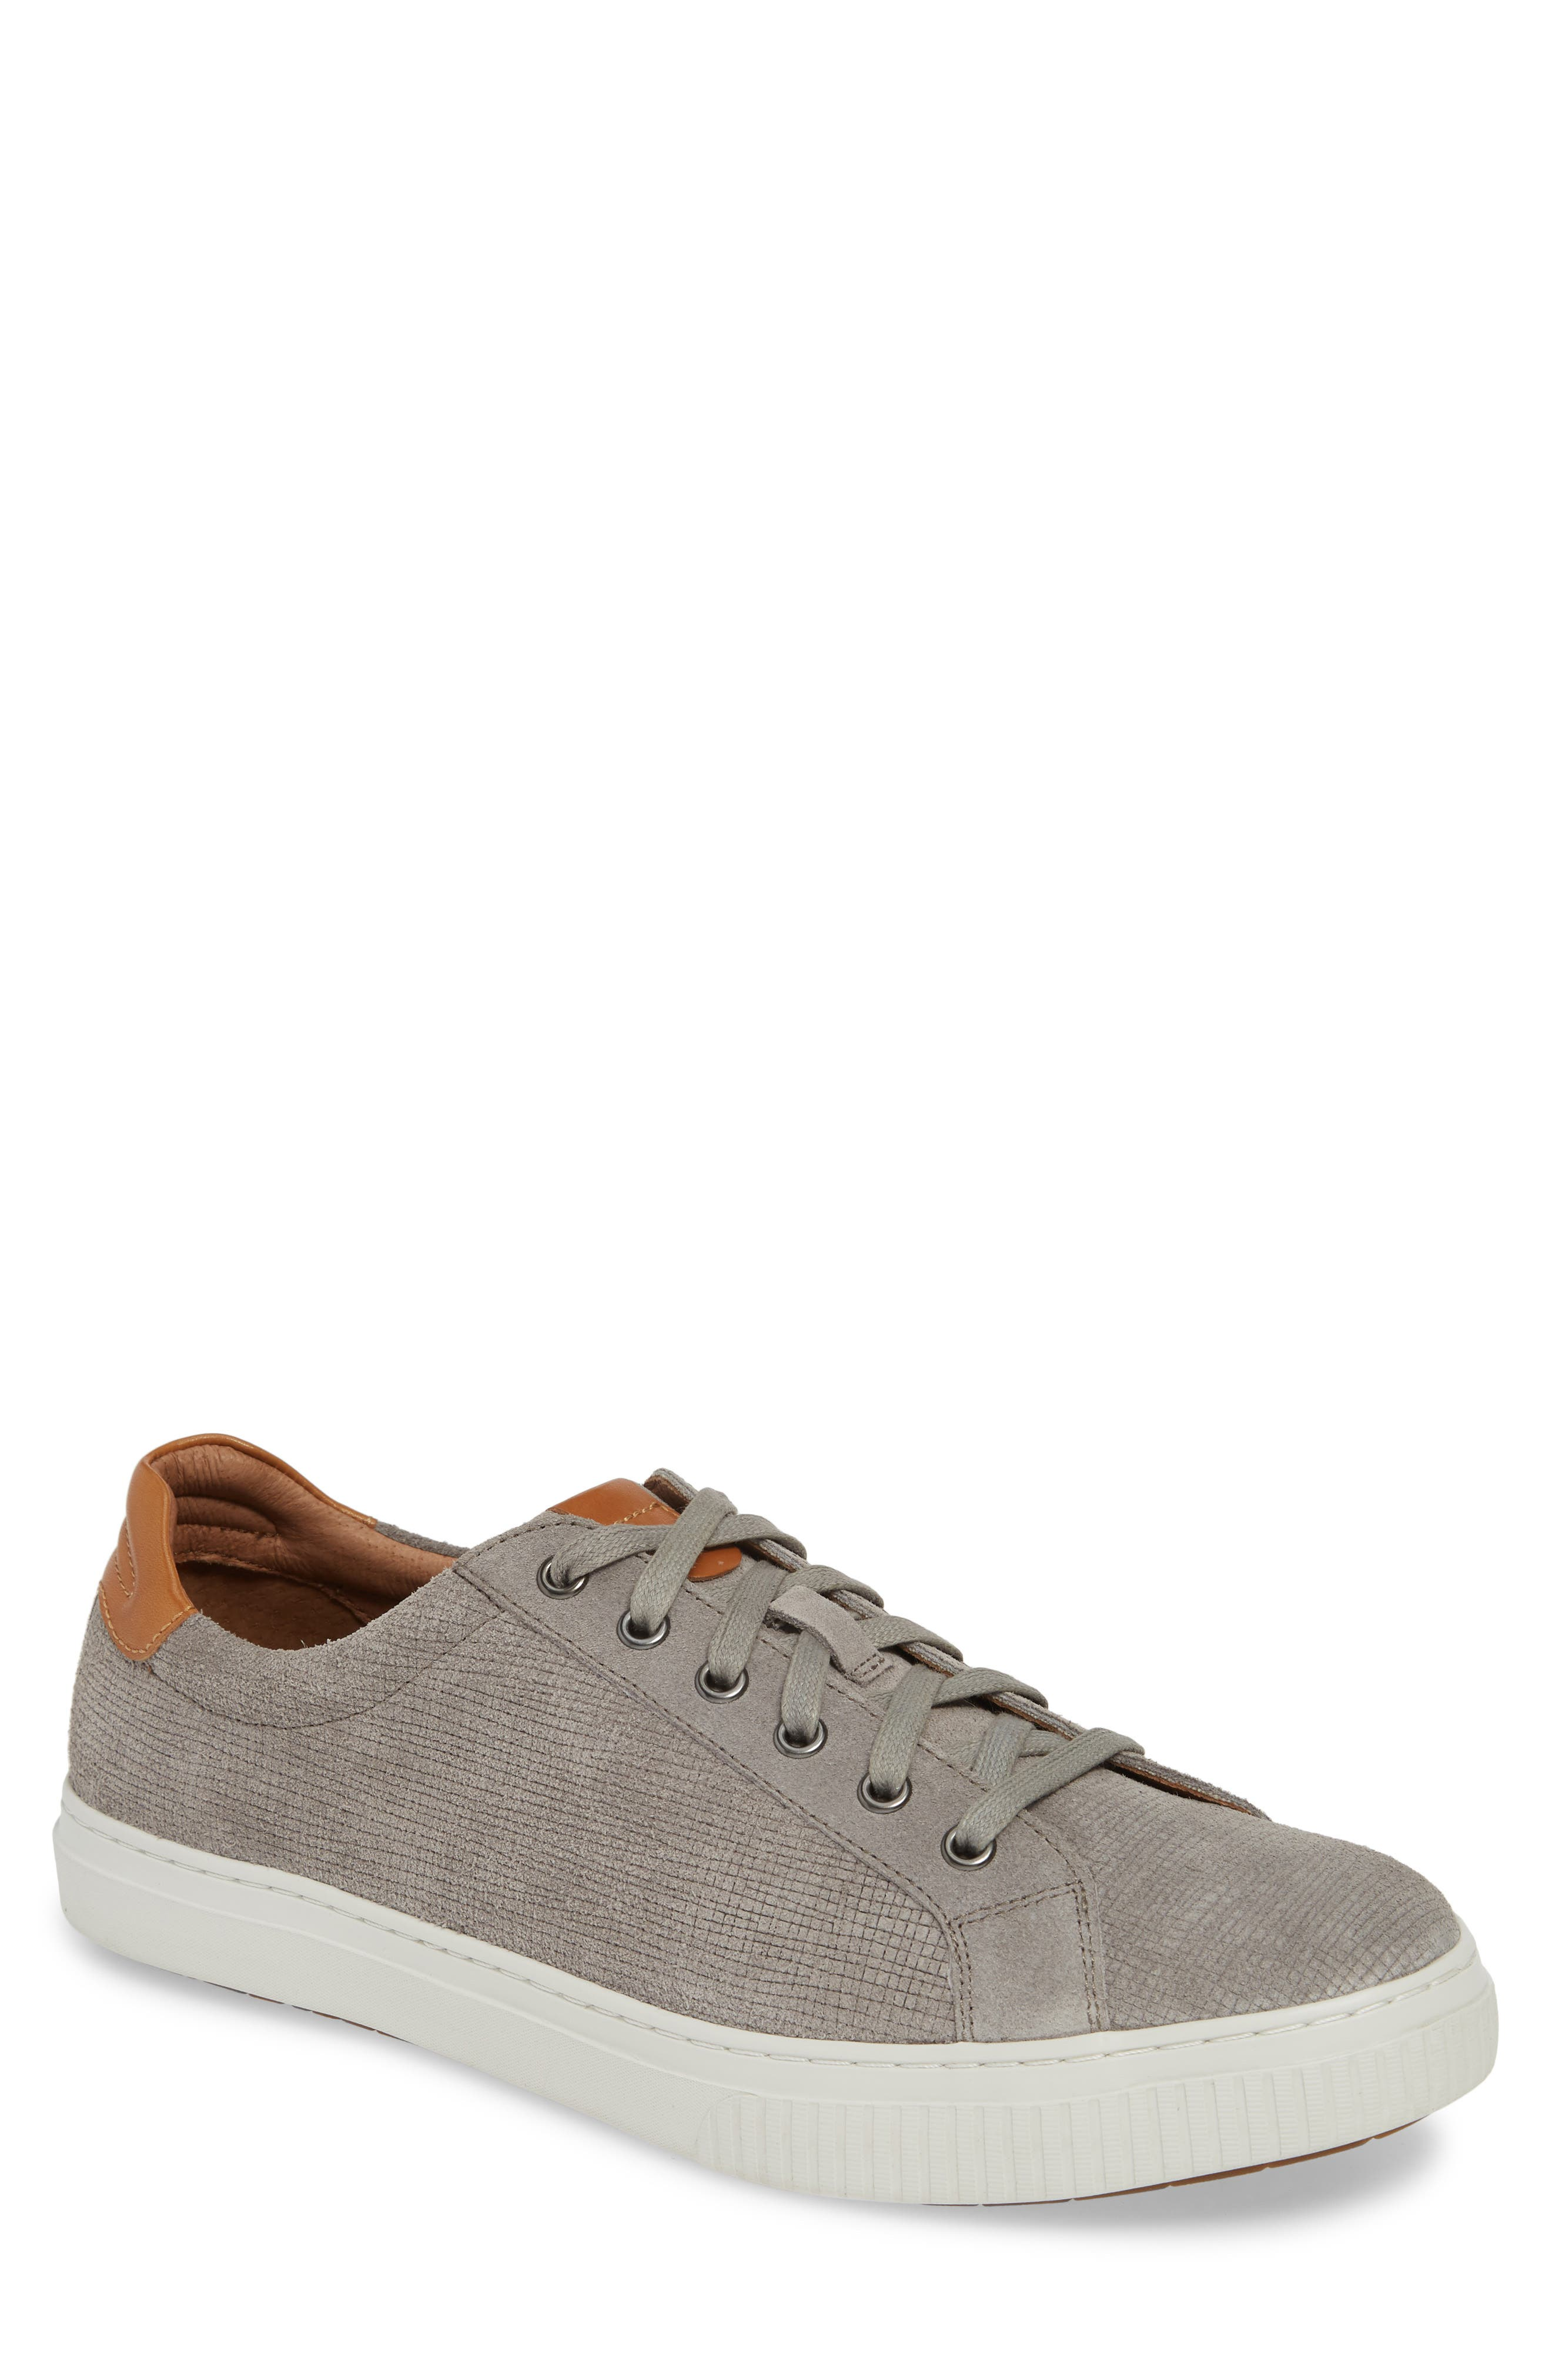 J&M 1850 Toliver Low Top Sneaker, Main, color, GREY SUEDE